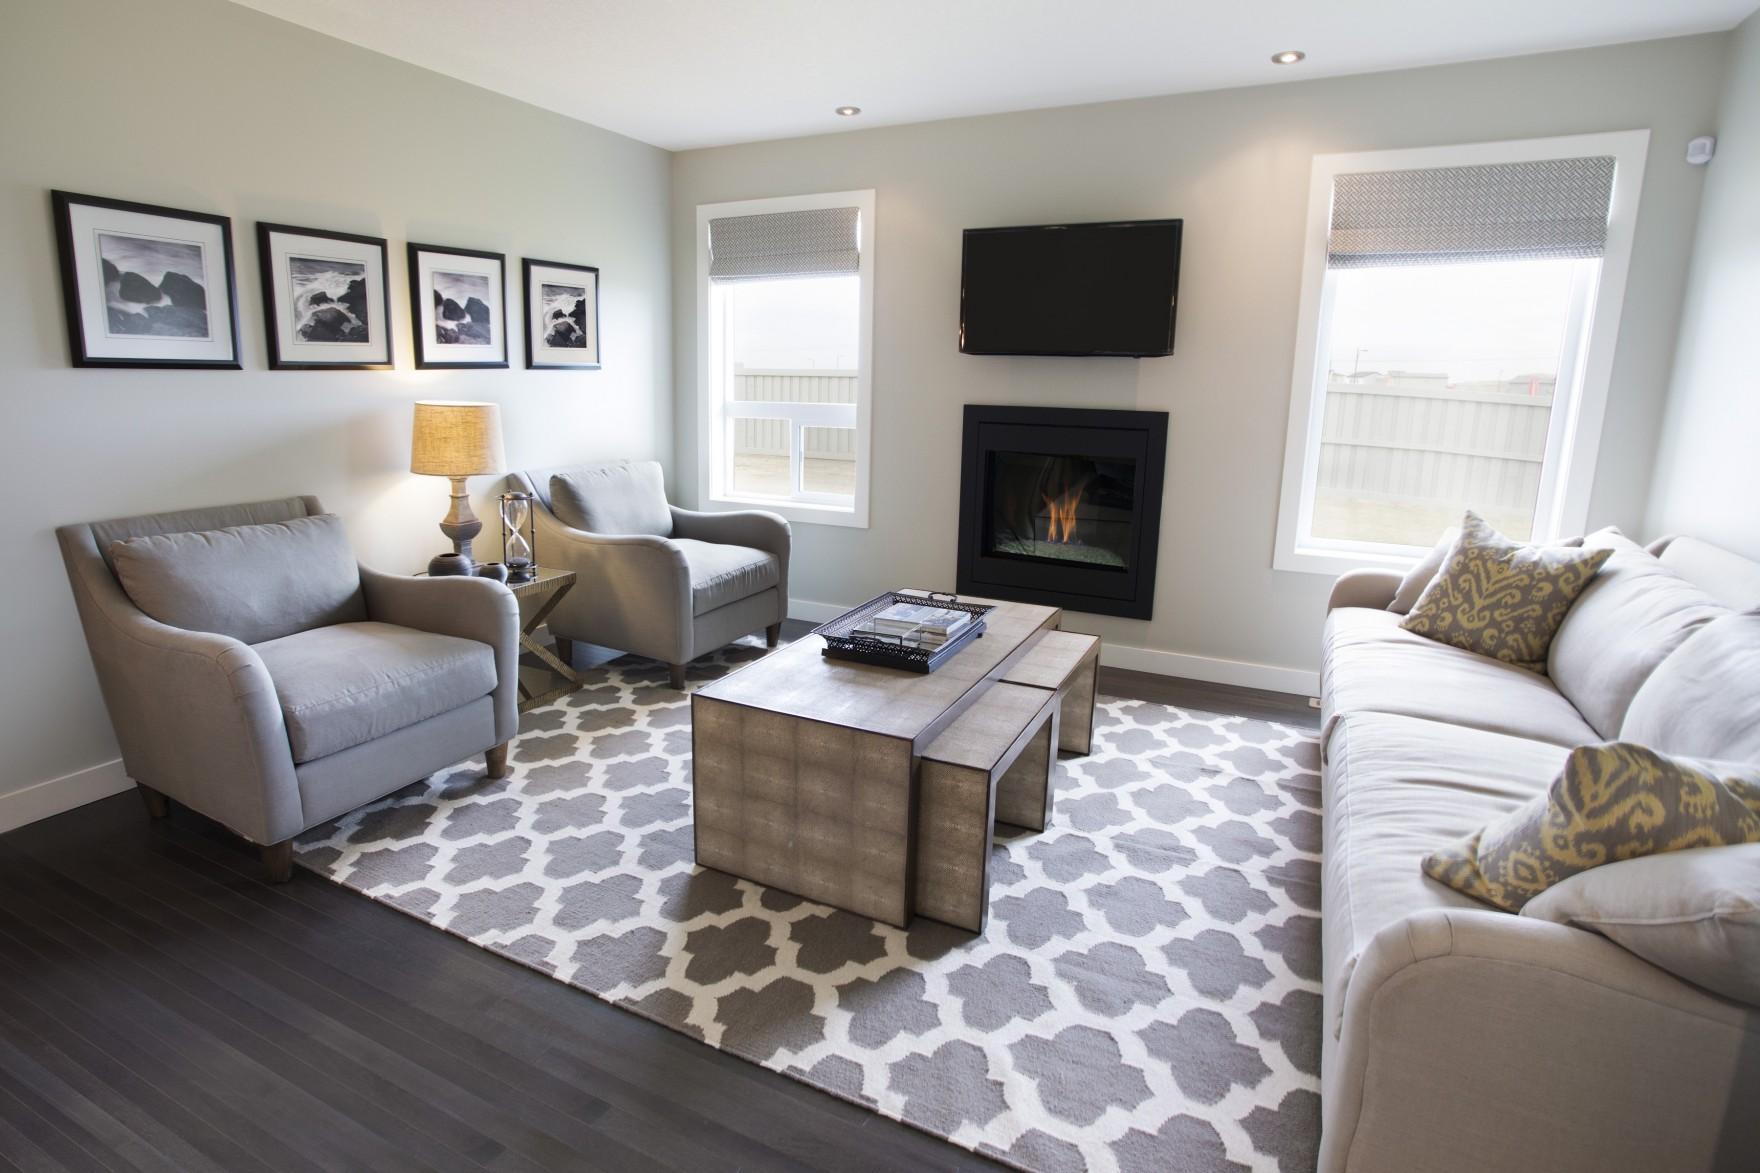 living room show homes furniture arrangements westbury showhome thomsen built creekwood chappelle home the